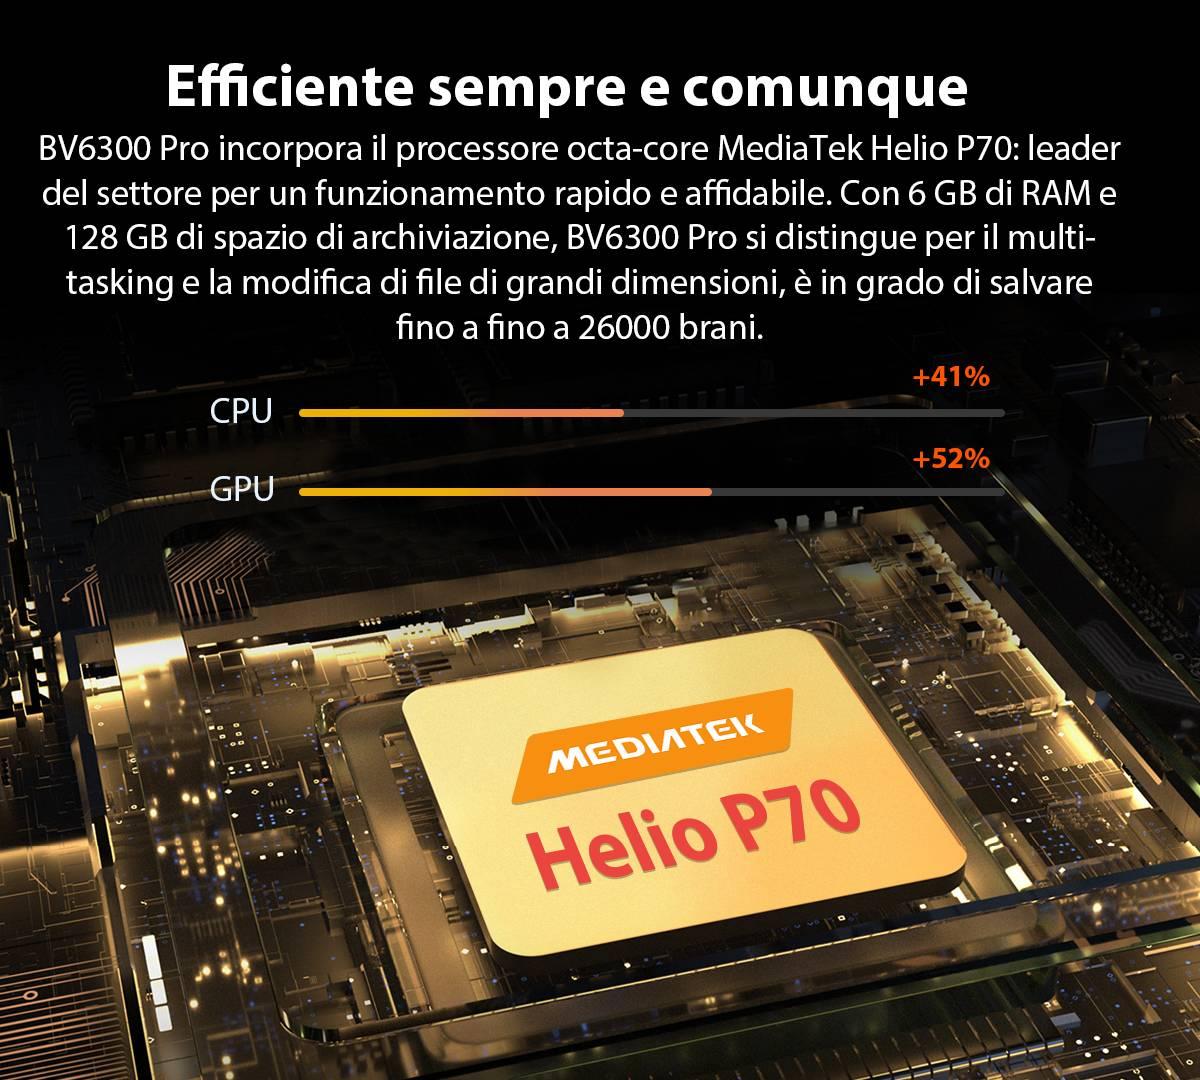 BV6300 Pro HD+